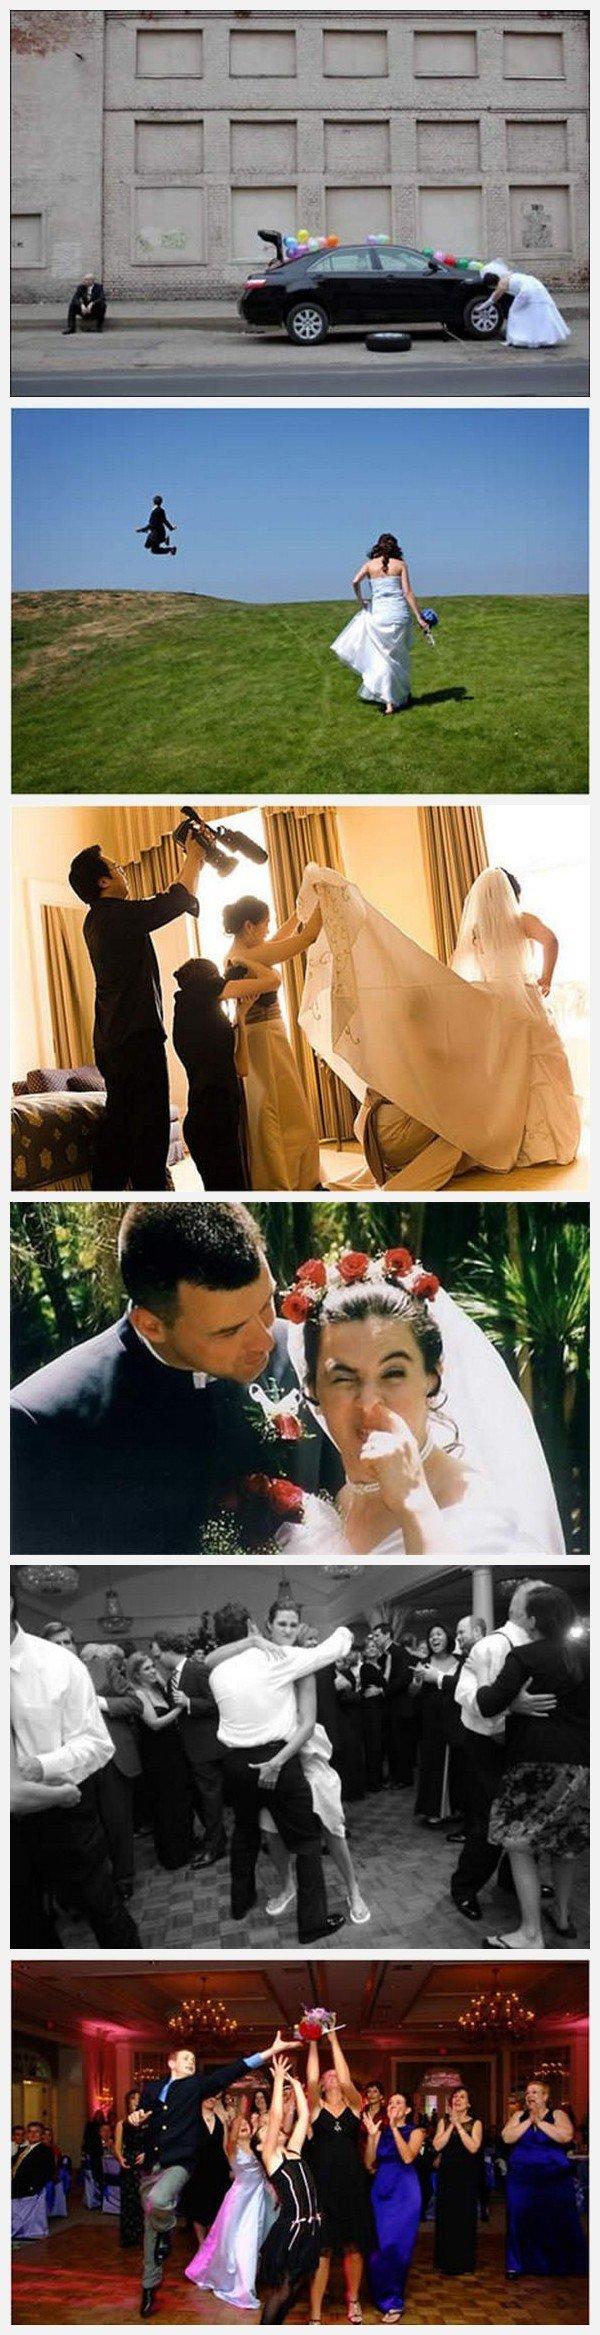 Wedding Photo fail pt2. Wedding photo fail pt 1 /funny_pictures/1990731/Wedding+Photo.... Wedding Photo fail